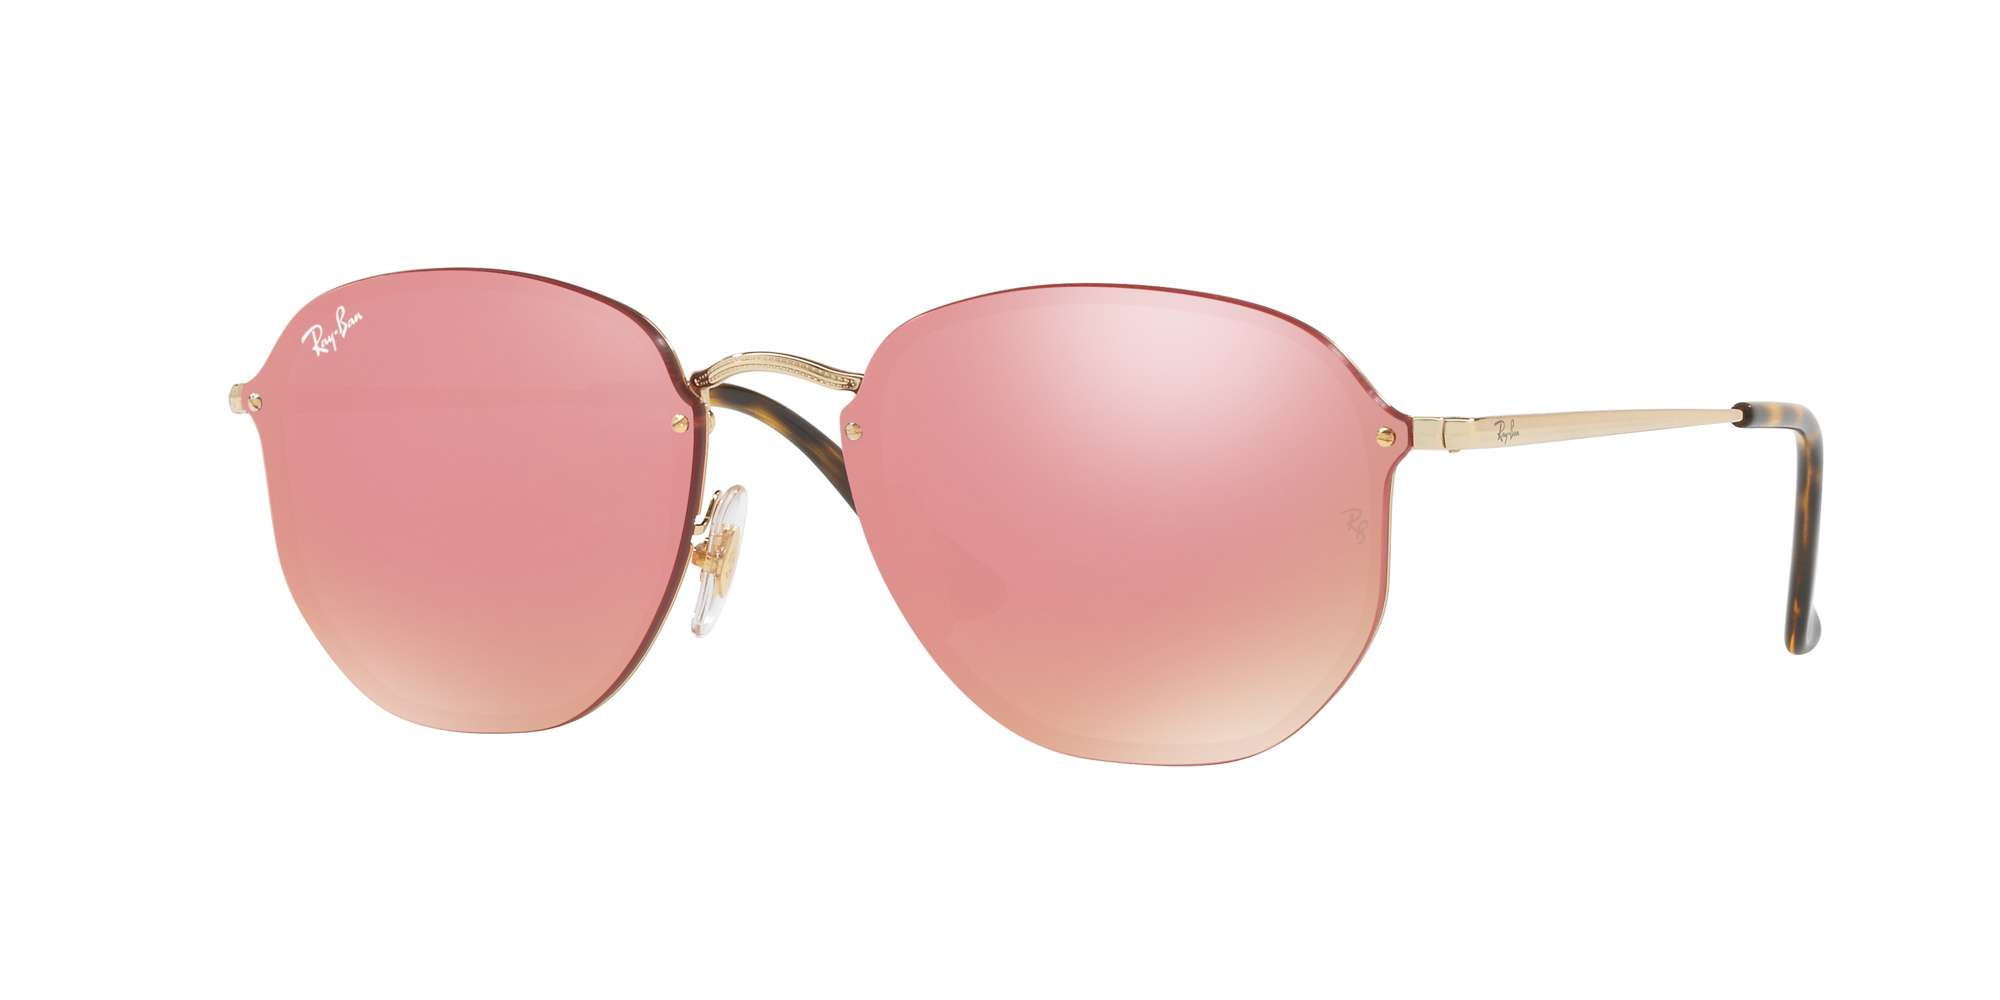 GOLD / PINK MIRROR PINK lenses